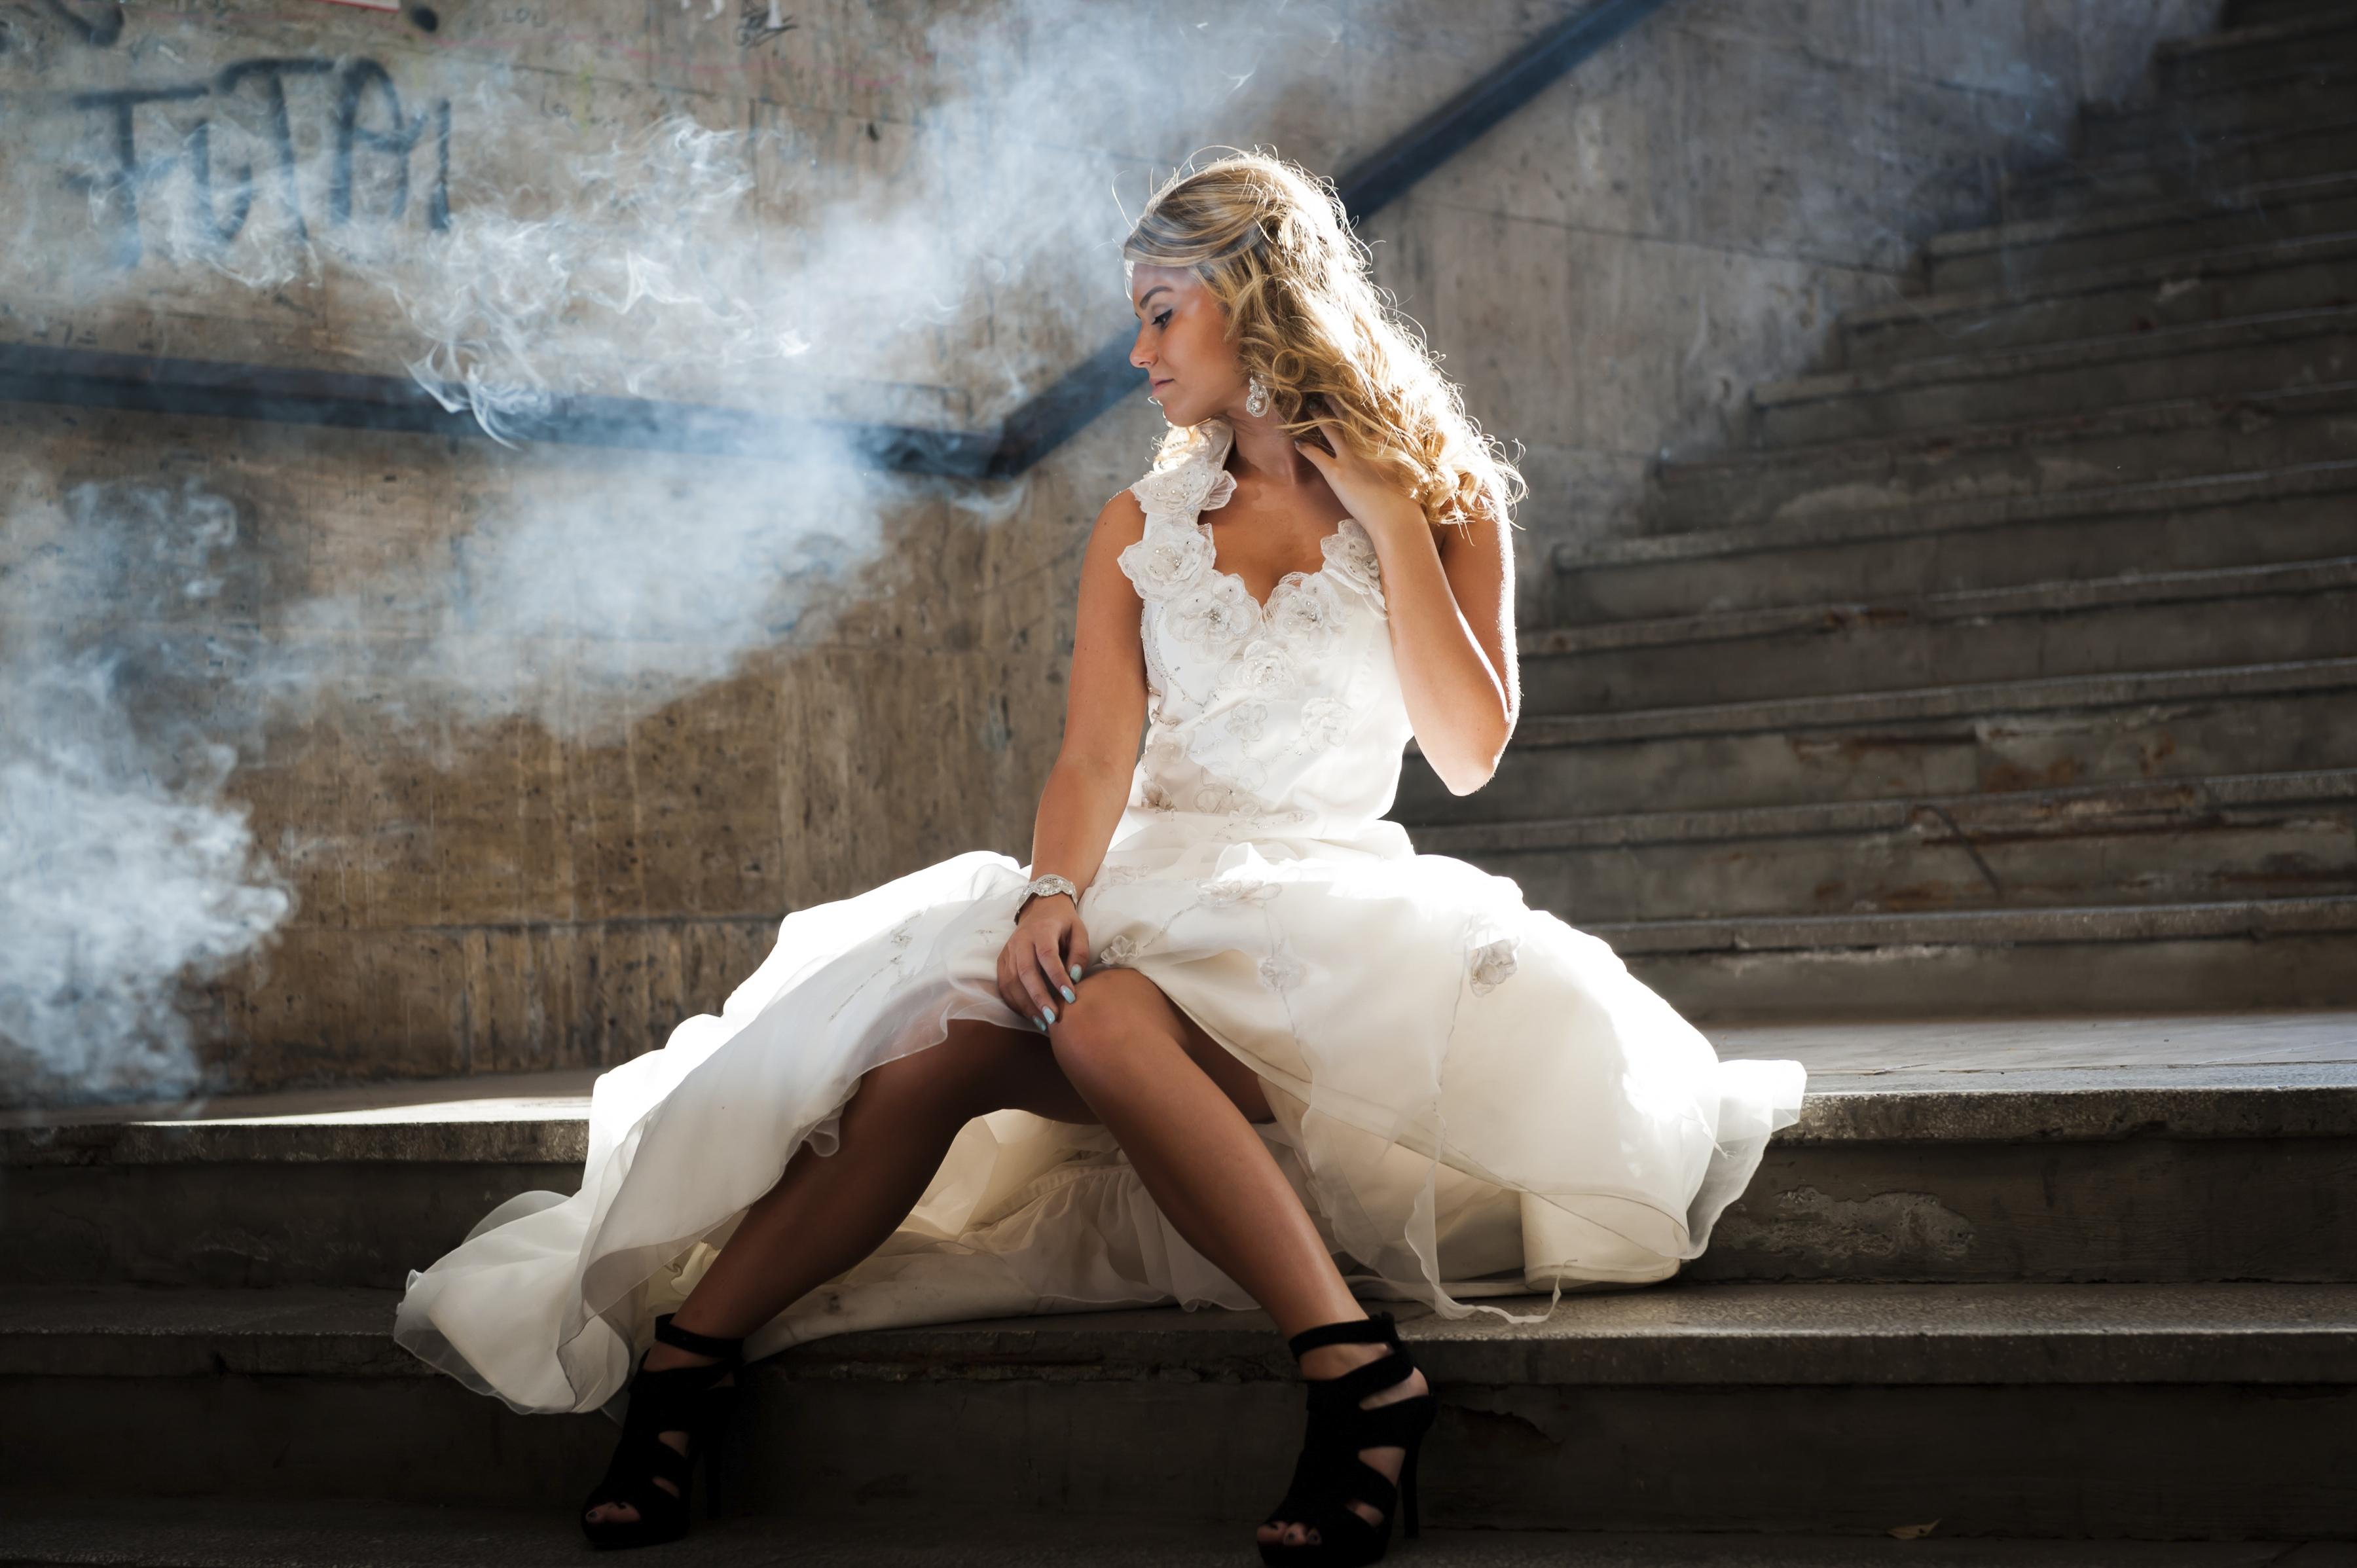 https://sleeklens.com/wp-content/uploads/2018/09/wedding-lightroom-presets-signature-bride-groom-before-10.jpg